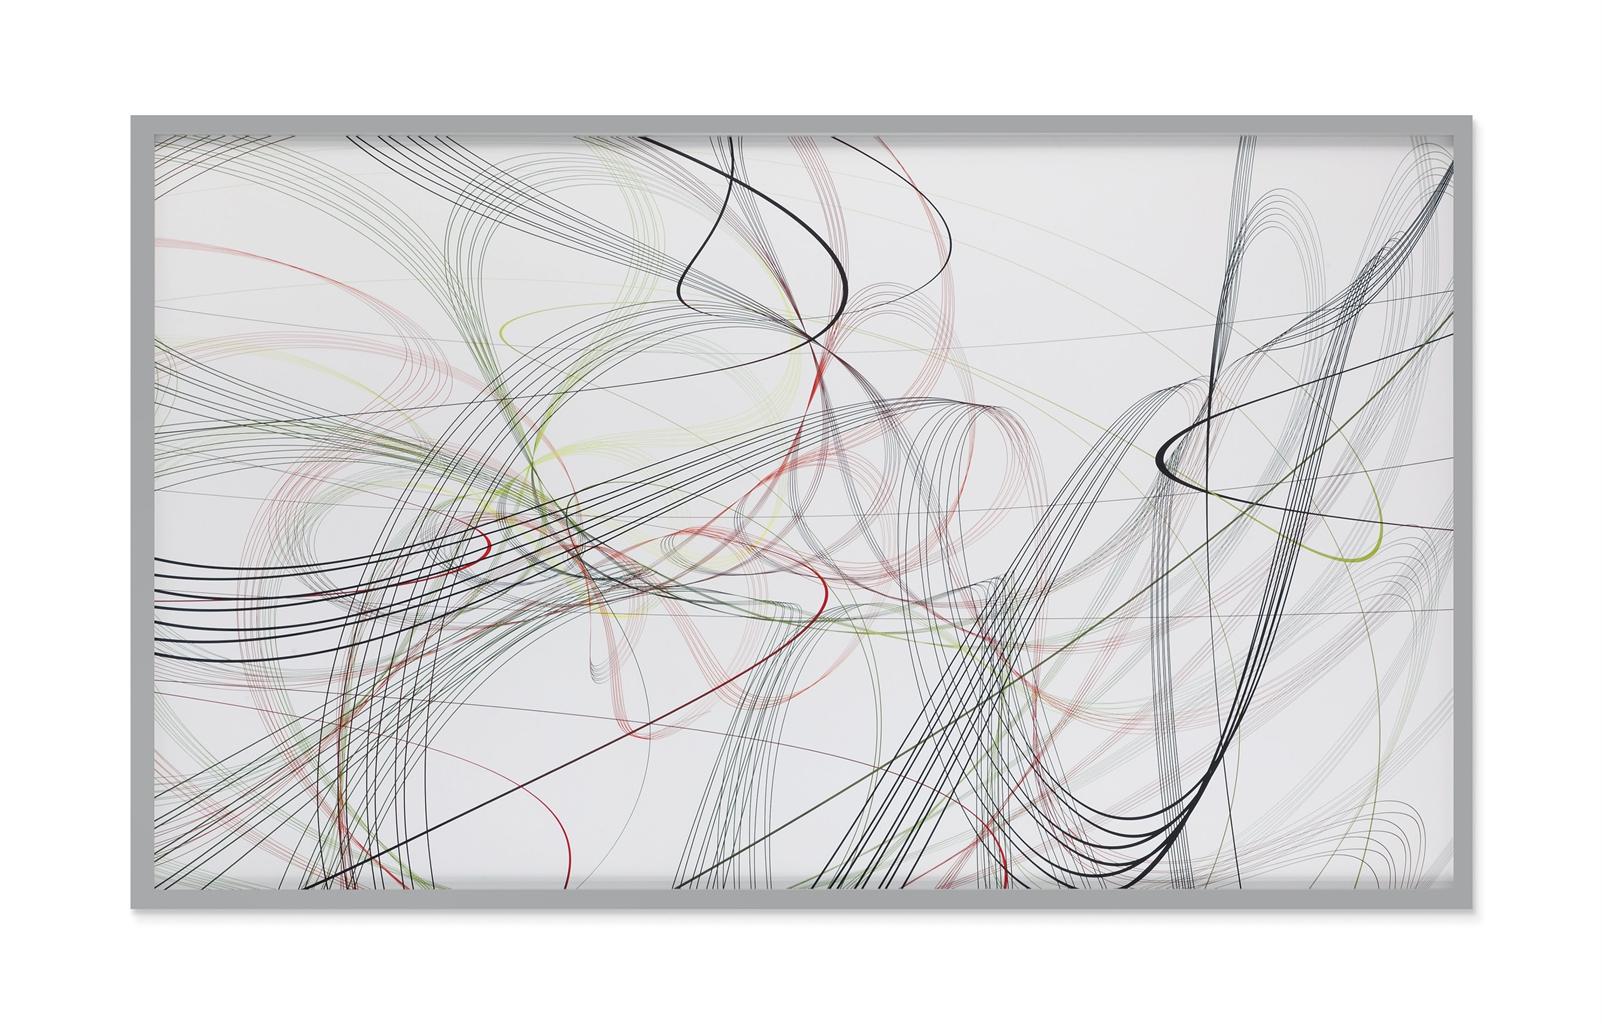 Thomas Ruff-Zycles 3045 (Cycles 3045)-2008